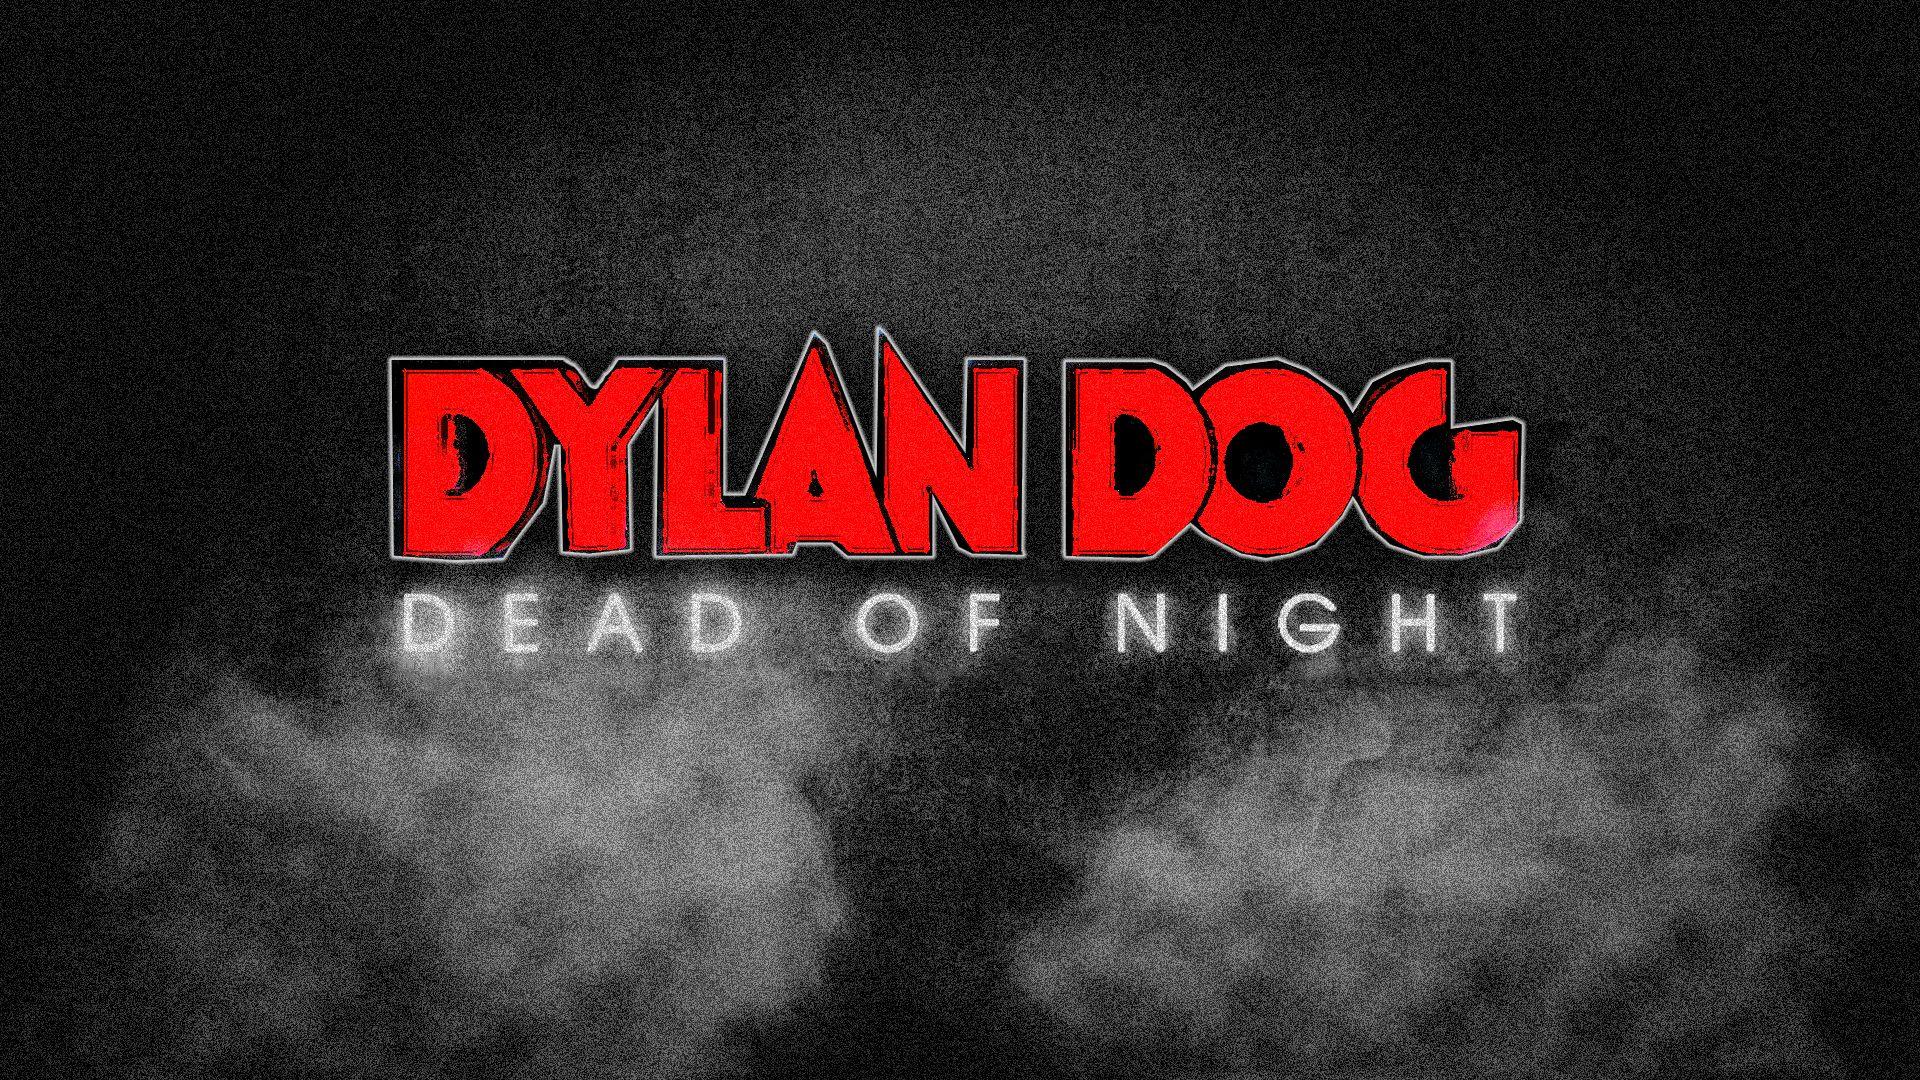 Dylan Dog wallpaper 1